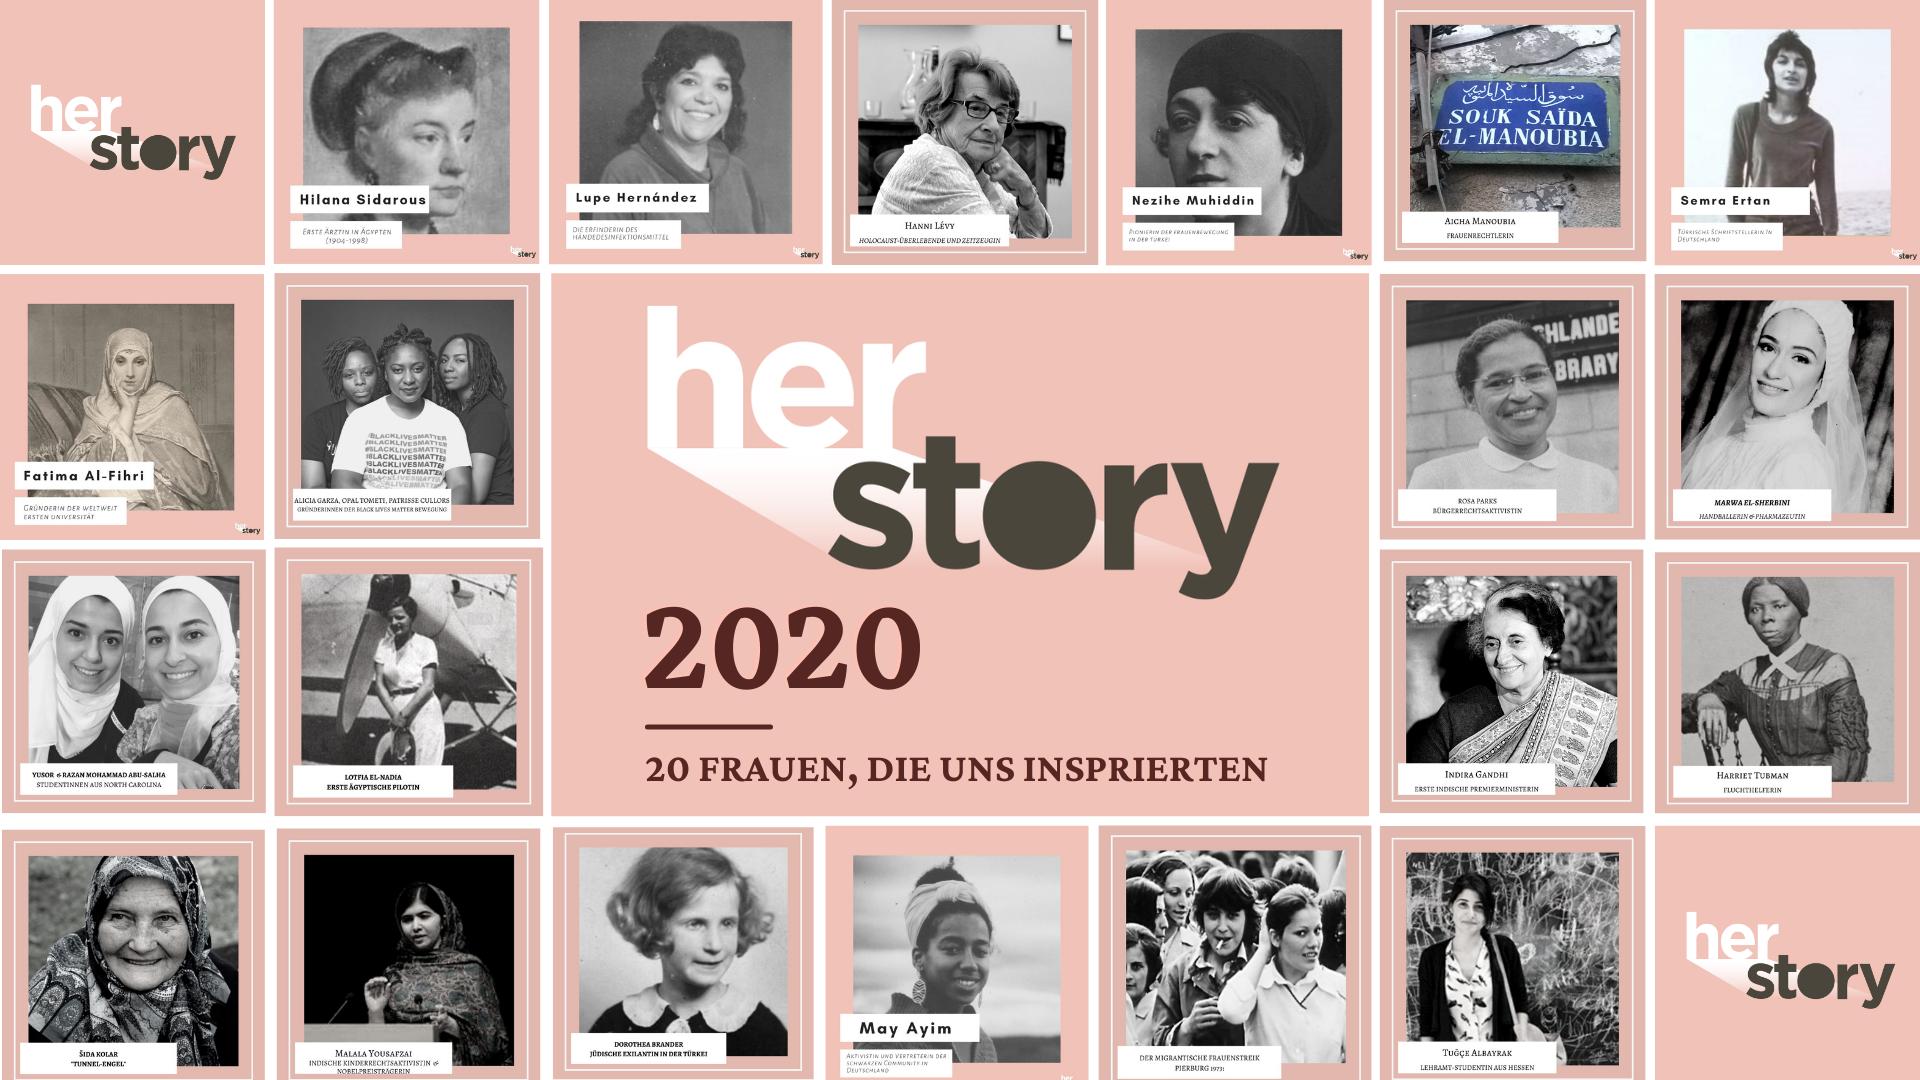 herstory portraets 2020 001